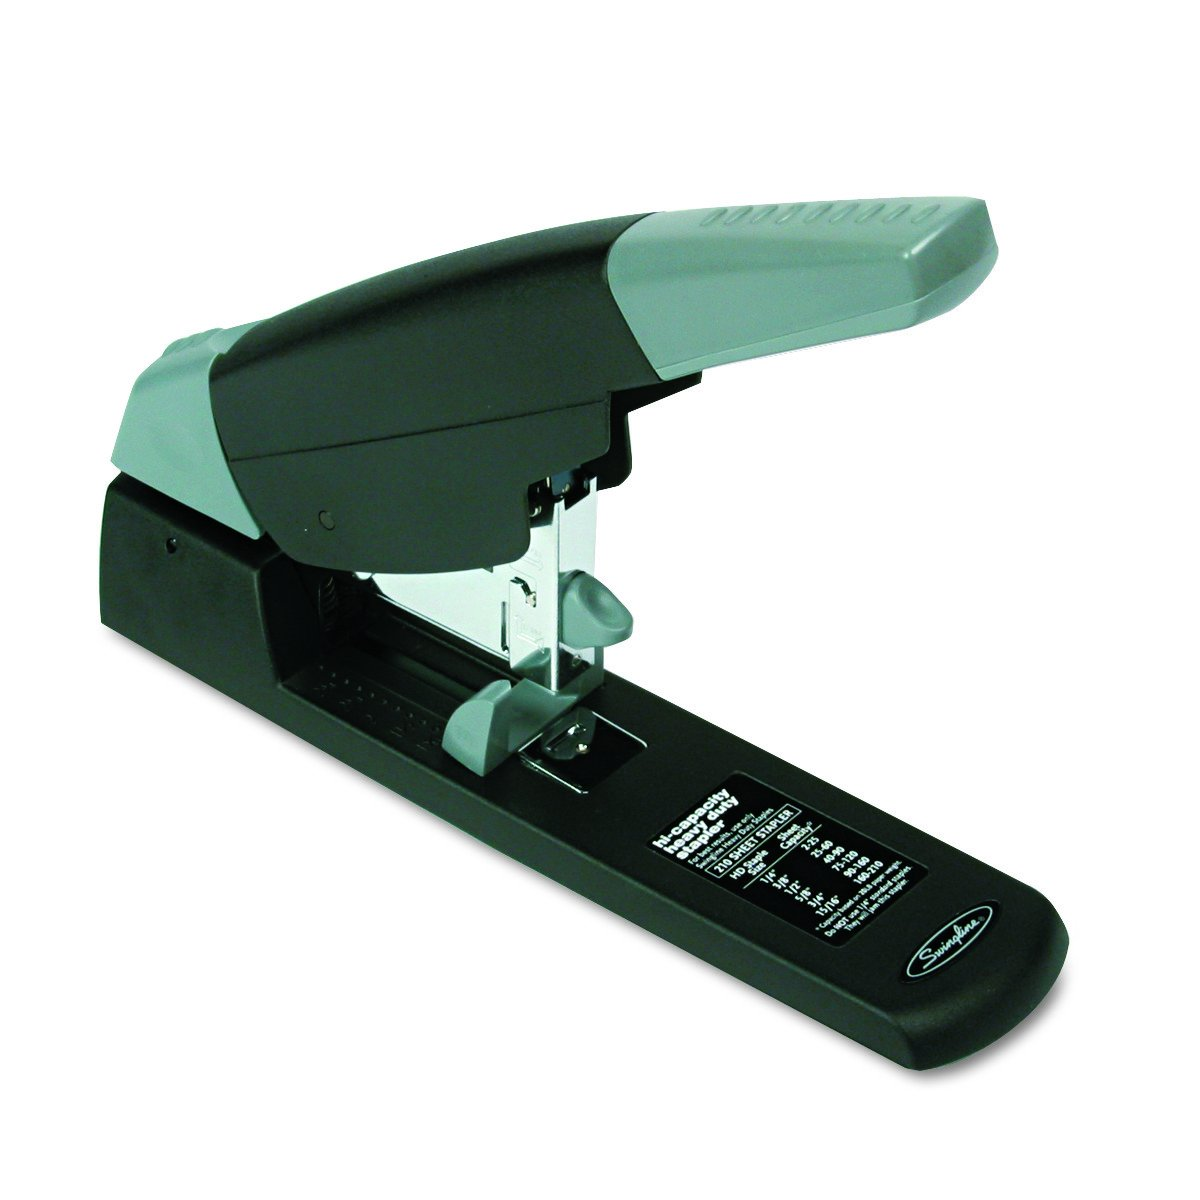 Swingline 210 Sheet Capacity Heavy Duty Stapler (90002B) ACCO Brands Canada Inc. S7090002B